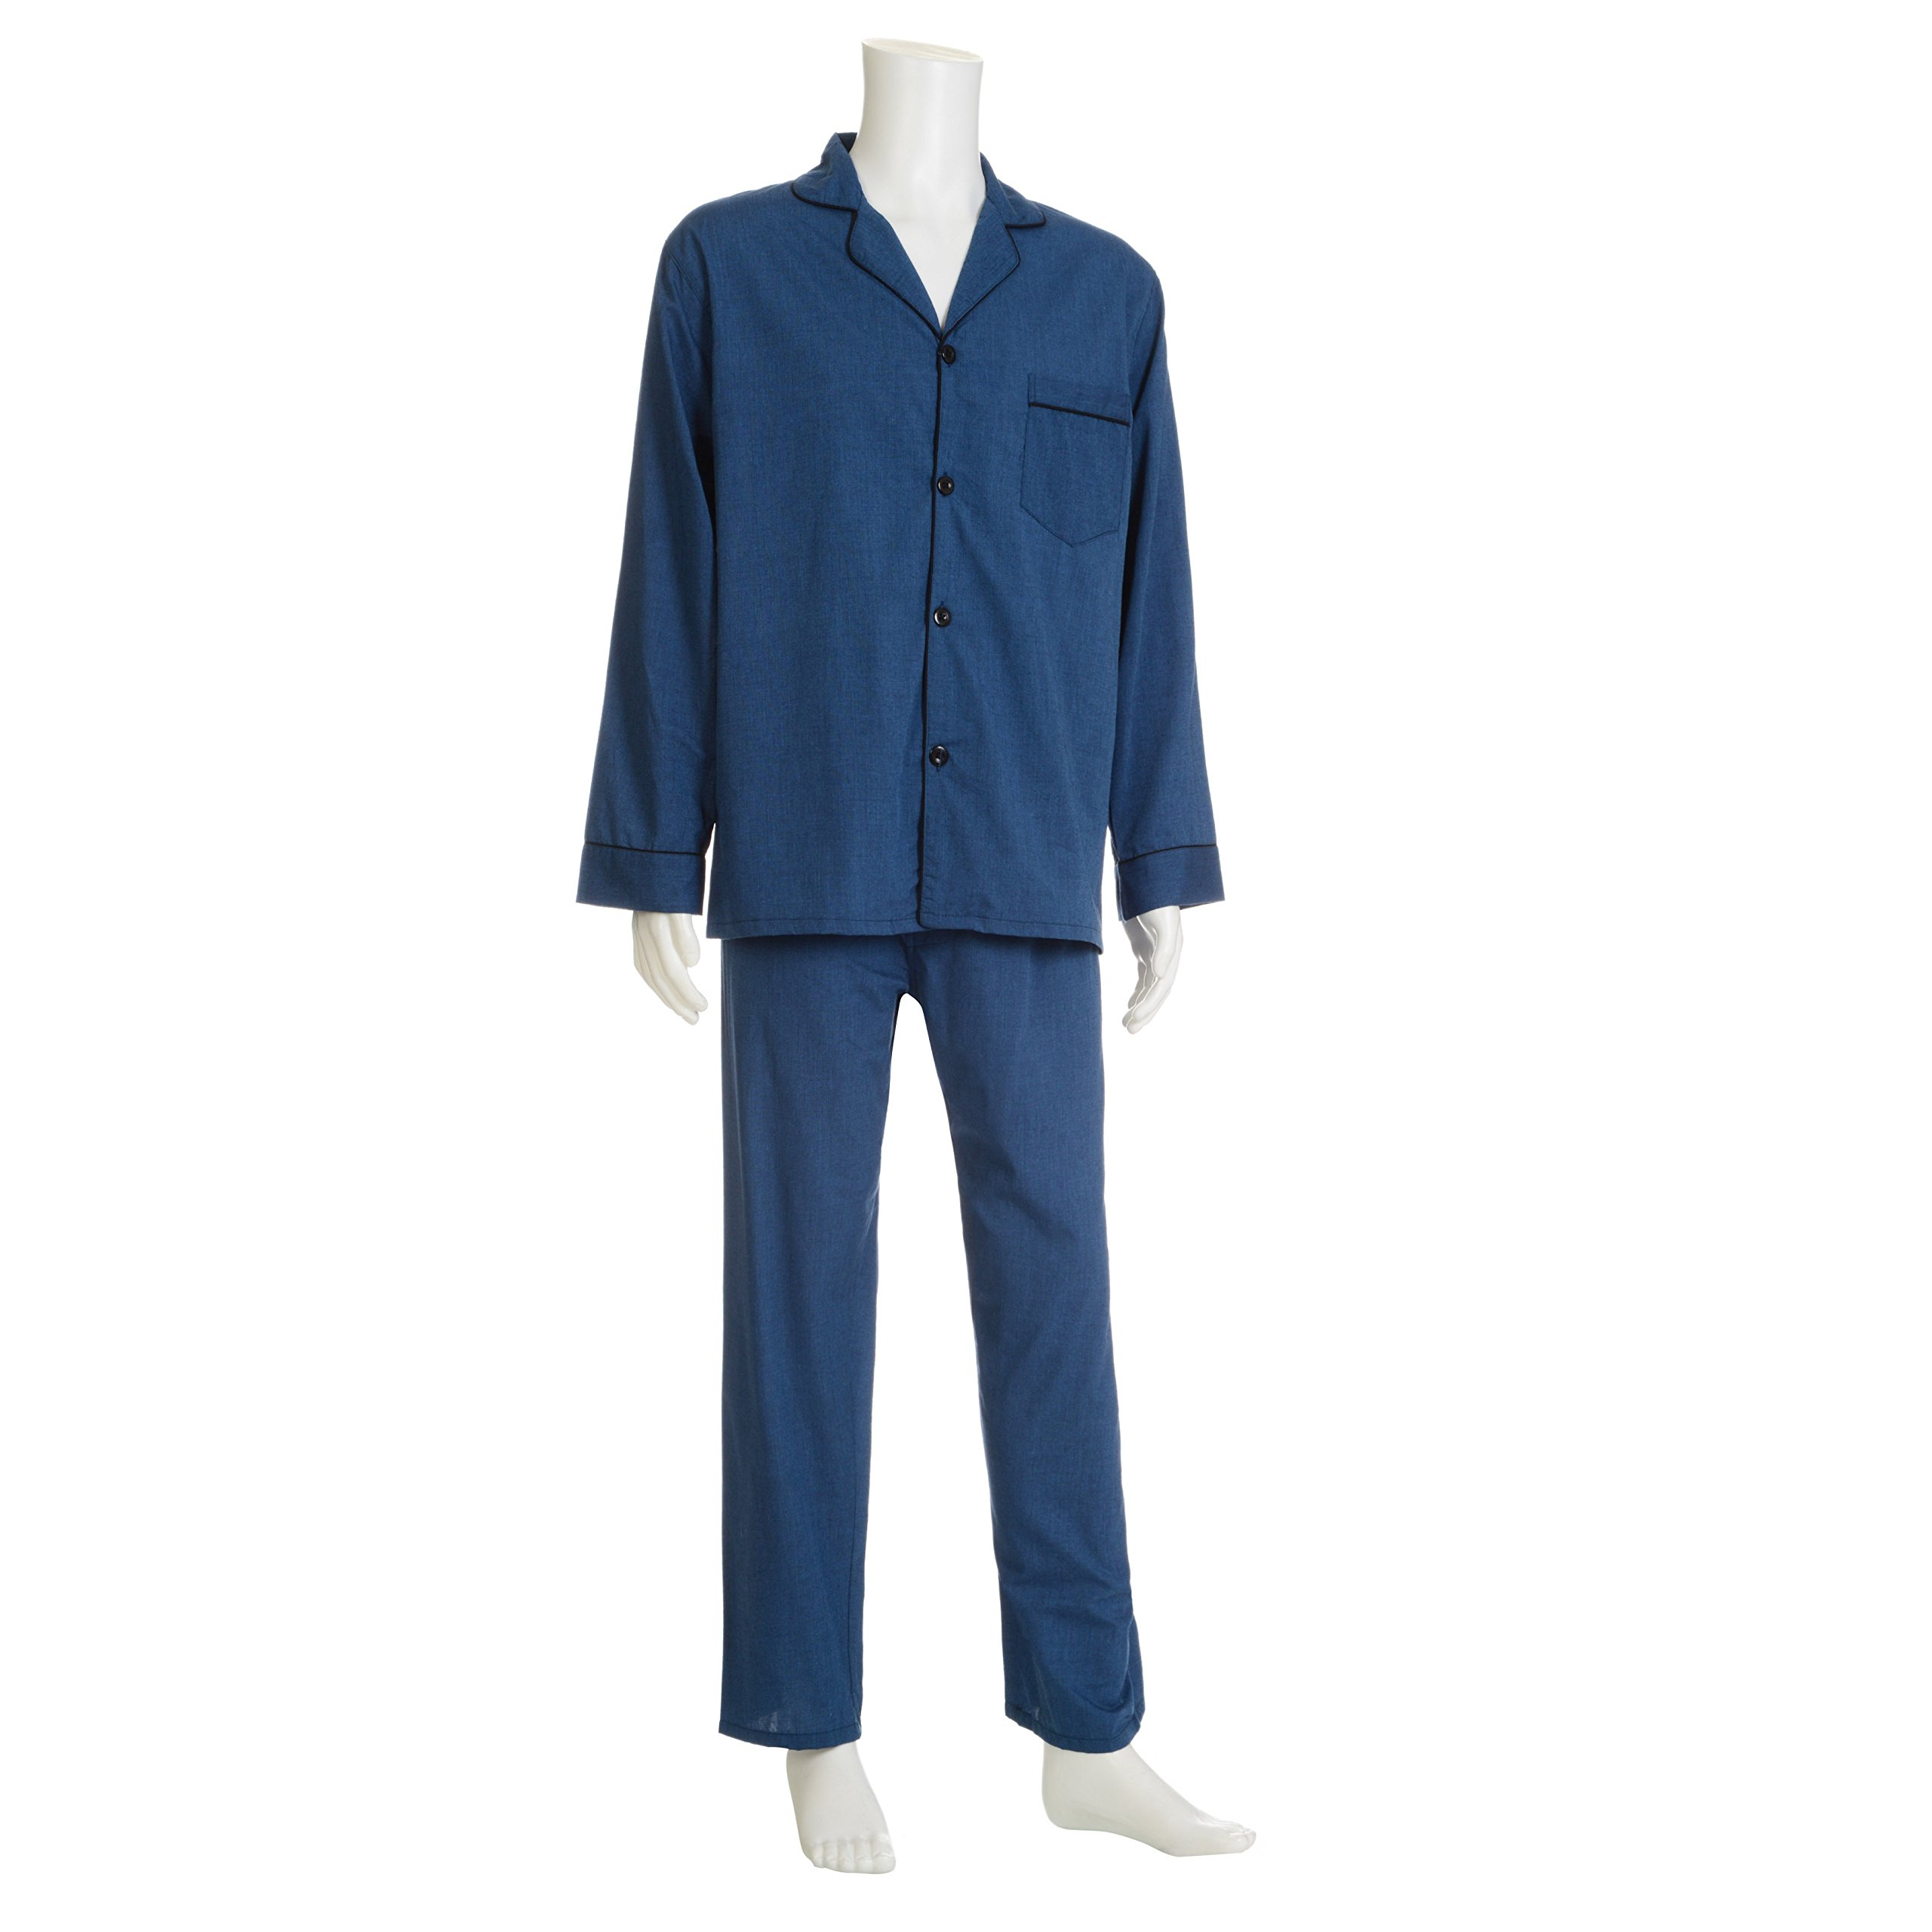 Hanes Big Men's Broadcloth Pajama Set, Navy 4X-Large